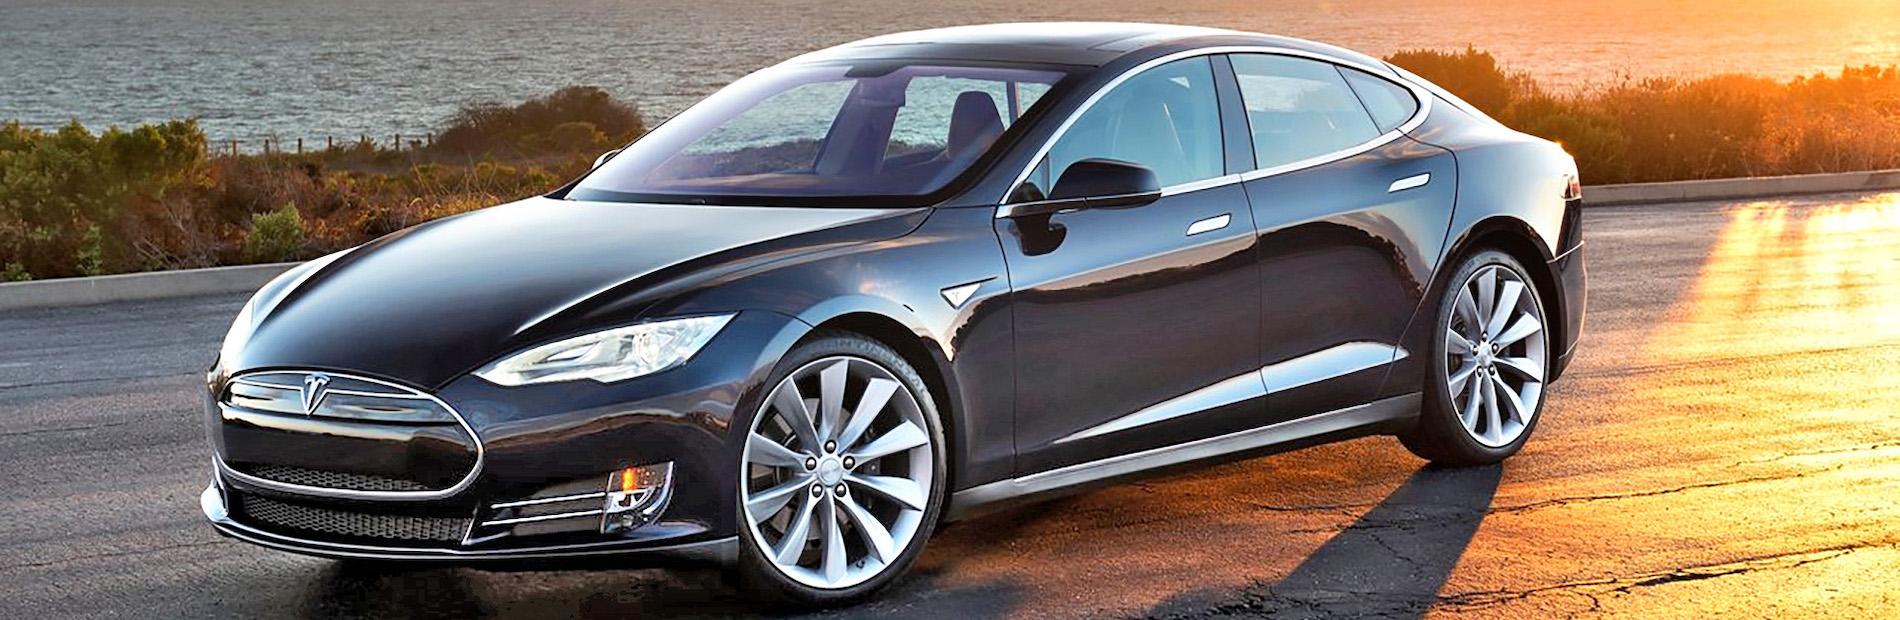 Tesla model S (od 2012 r.)